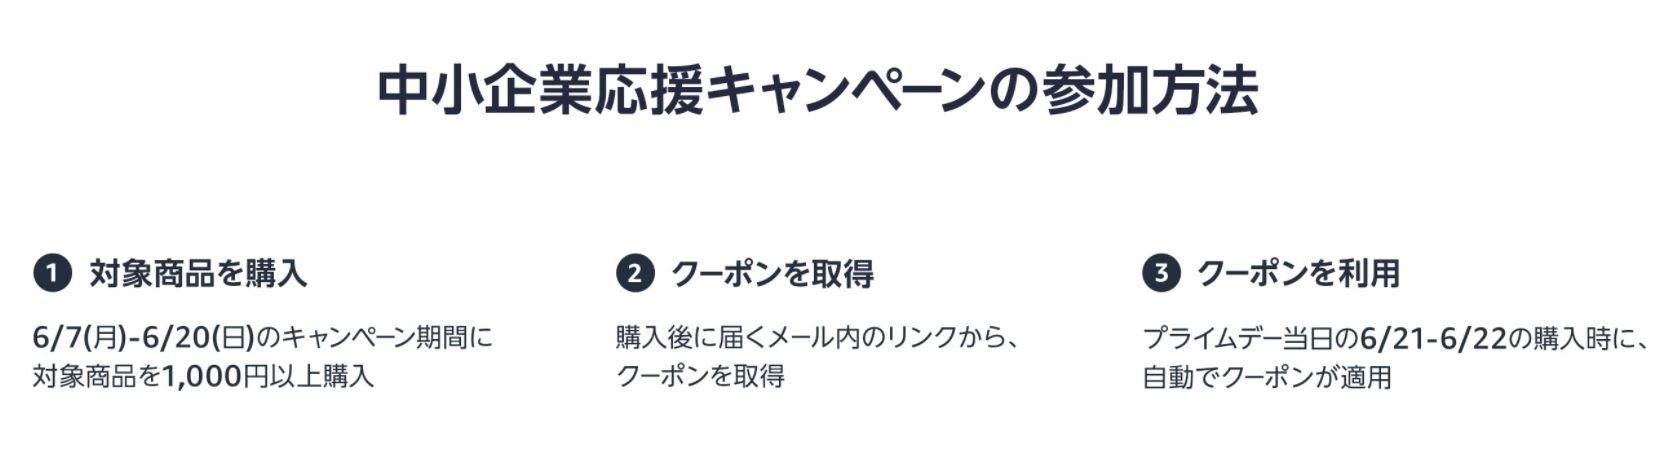 Amazonプライム2021 日本の中小企業を応援キャンペーン参加方法